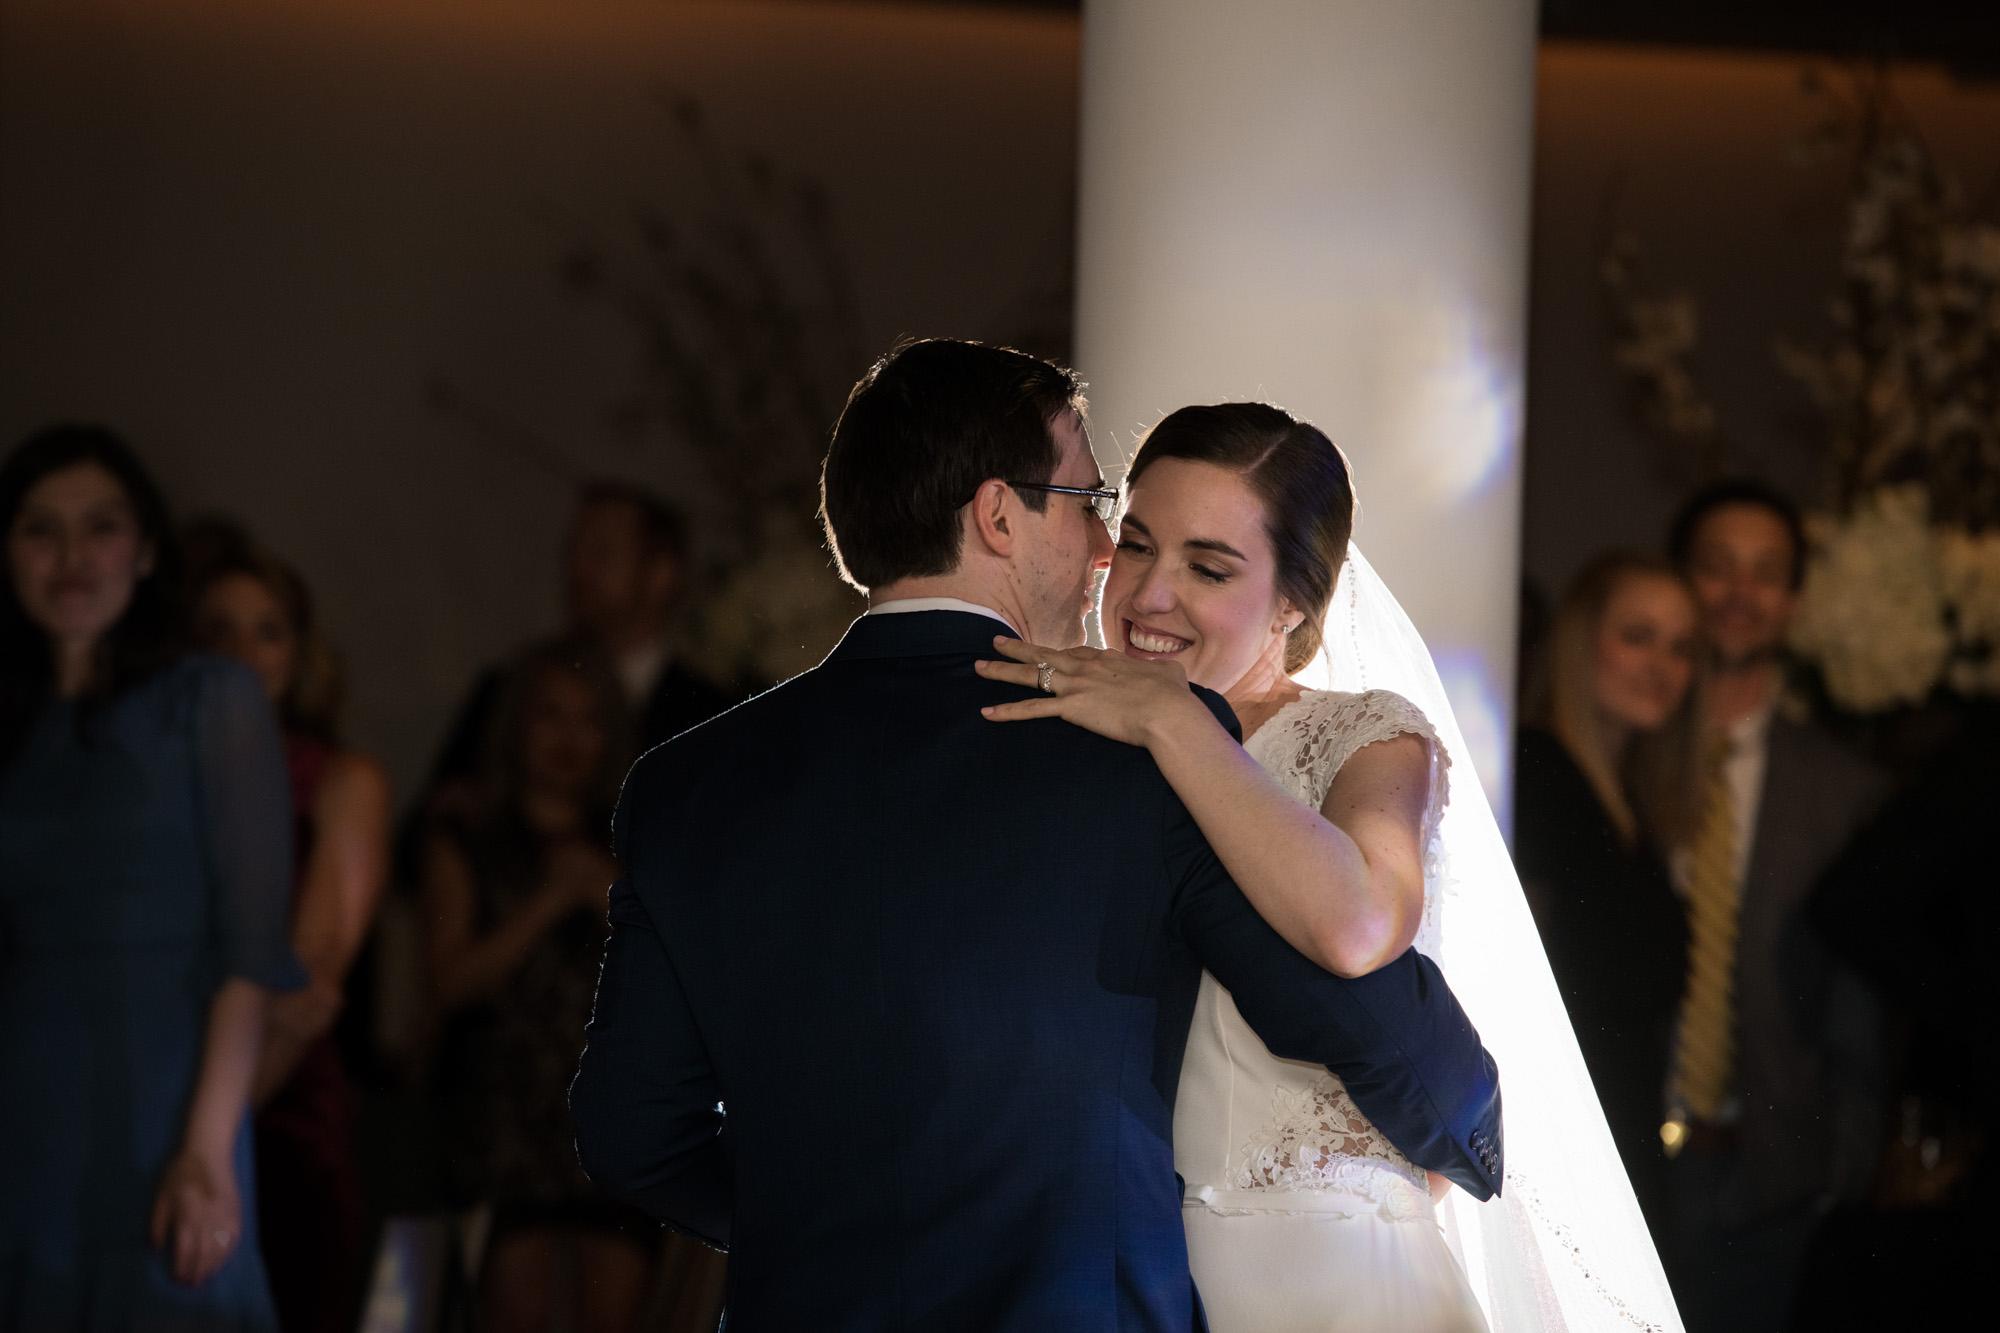 nj-wedding-photographer-maritime-parc-maria-david-45.jpg